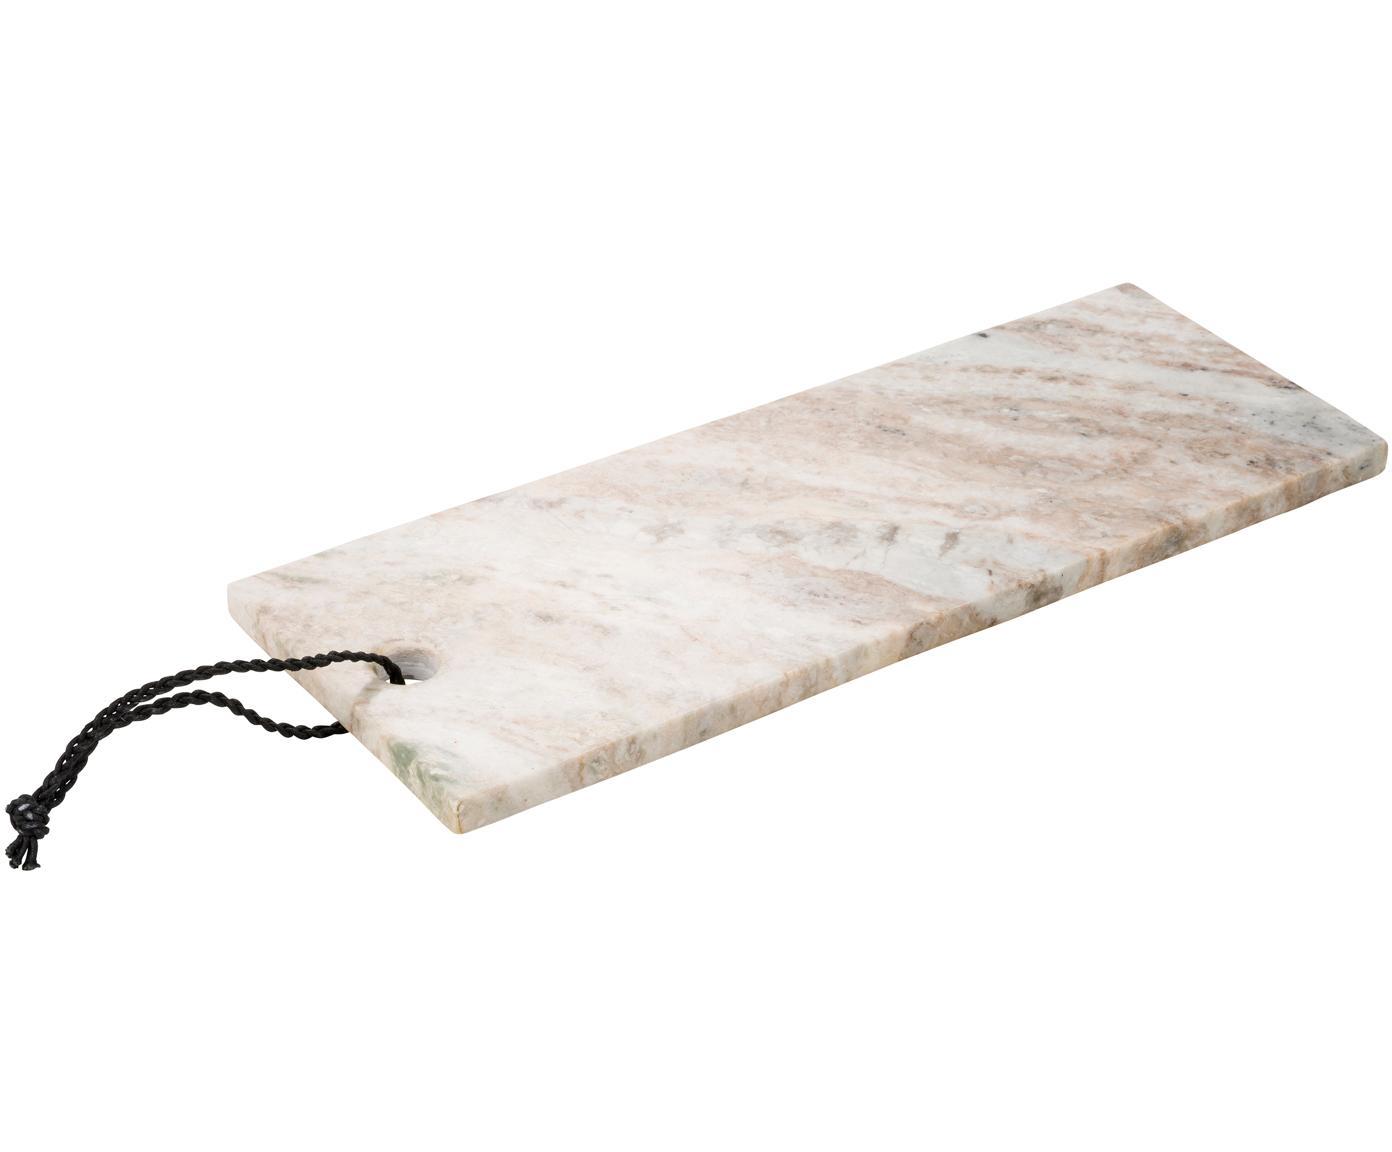 Marmor-Schneidebrett Torrant, Marmor, Beigetöne, Weiß, B 40 x T 15 cm